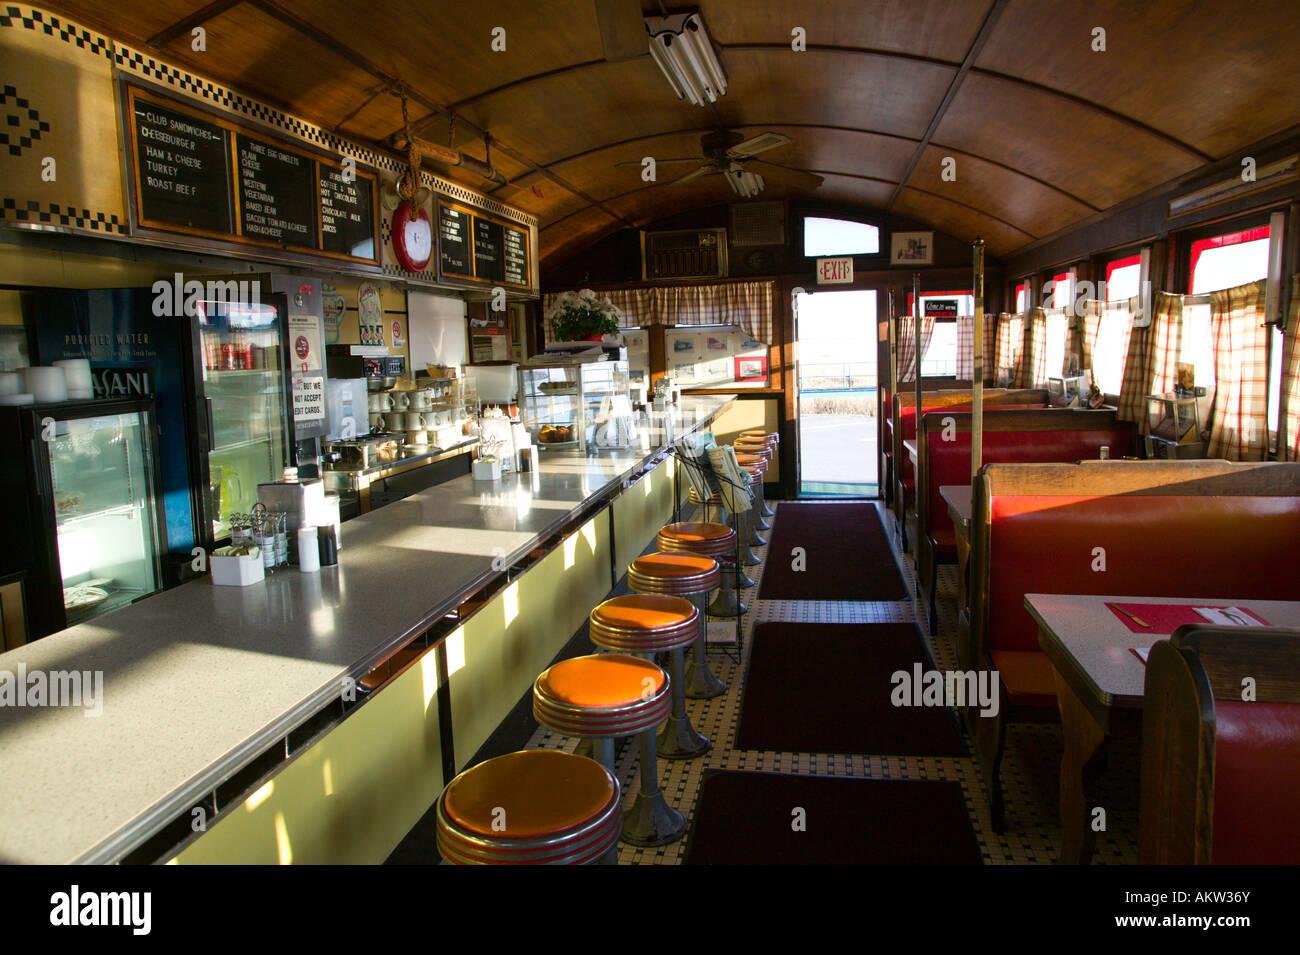 Interior of vintage diner restaurant stock photo royalty